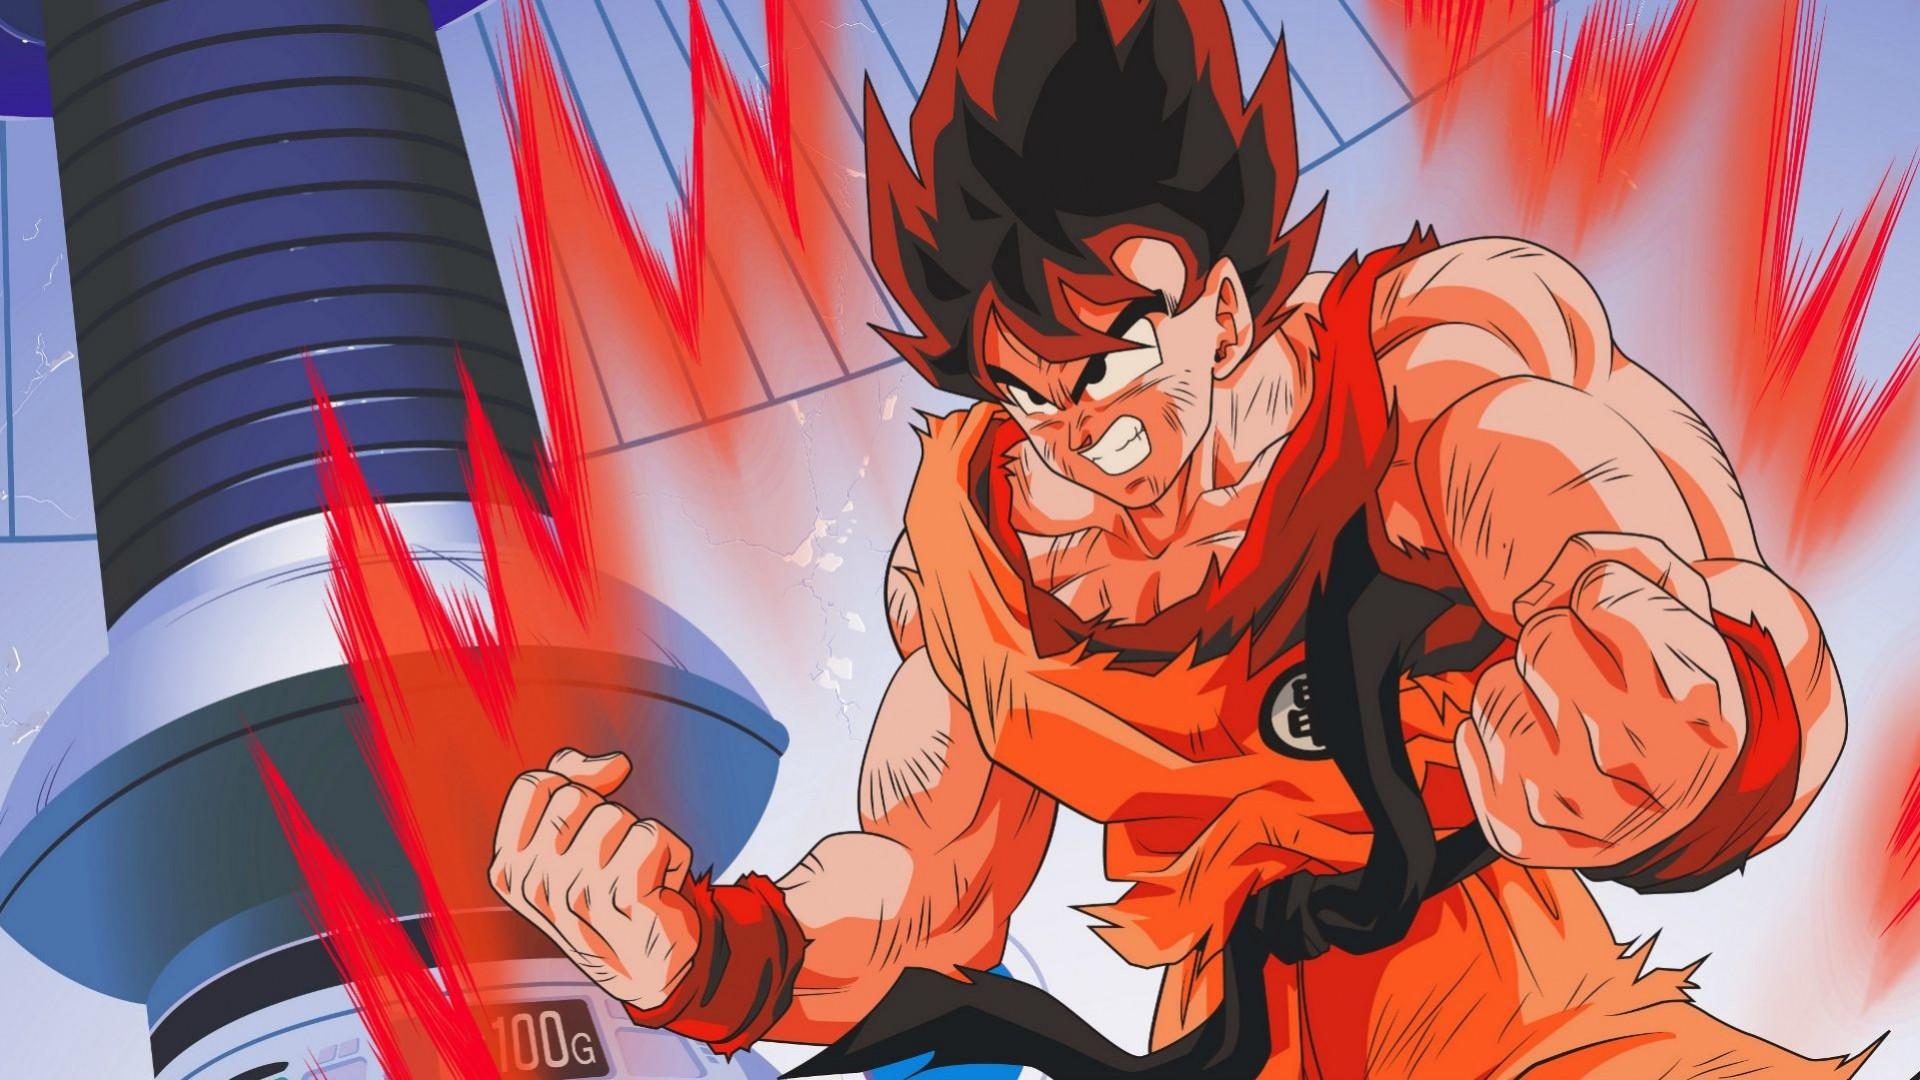 Wallpaper dragon ball z, goku, aggression, guy